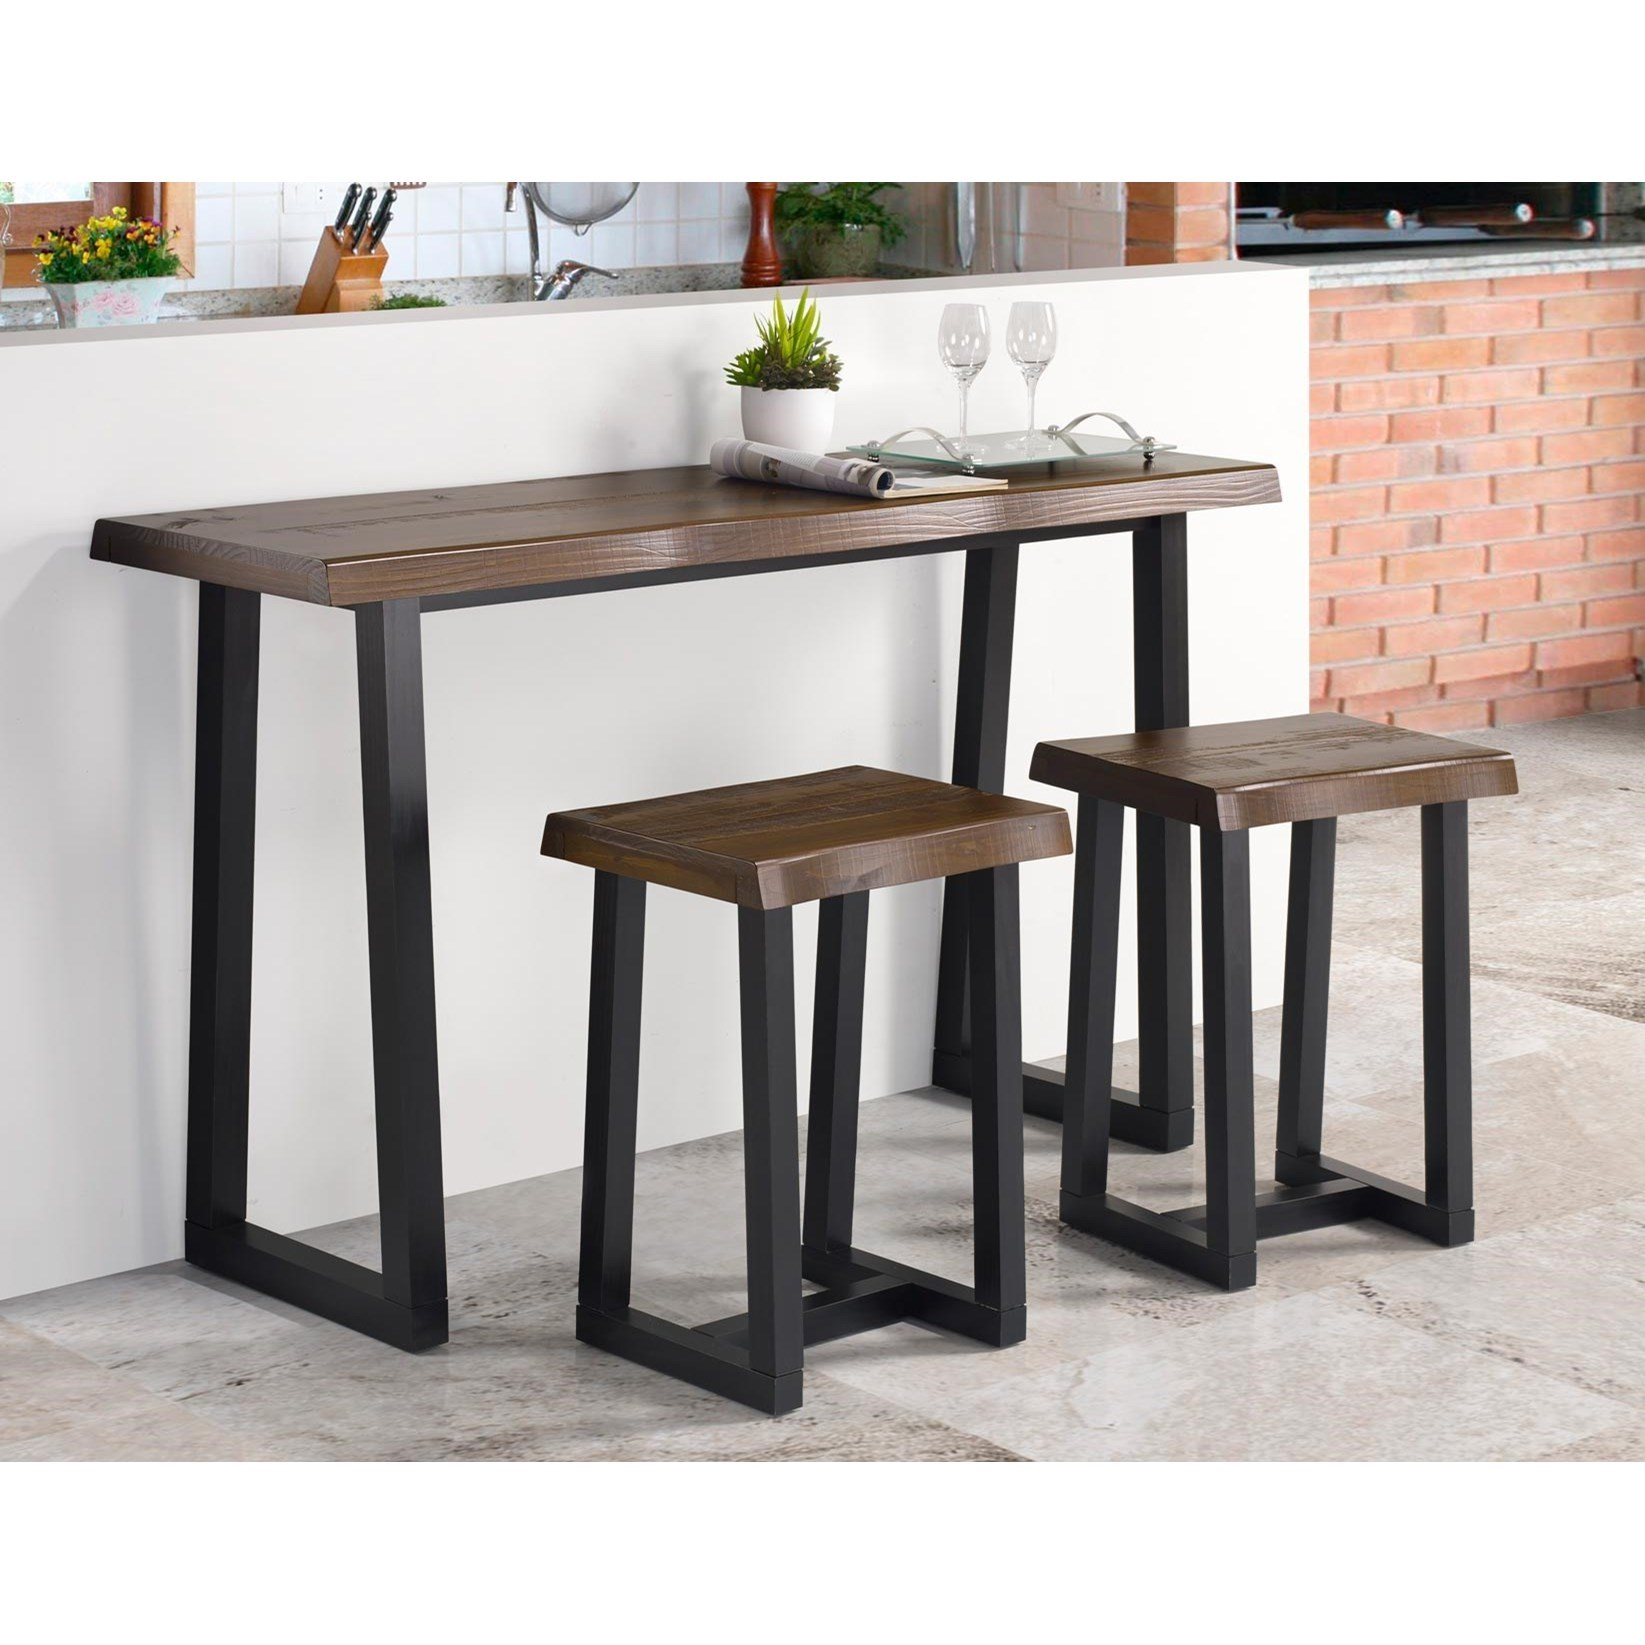 Jennings 3-Piece Bar Table Set by Steve Silver at Walker's Furniture